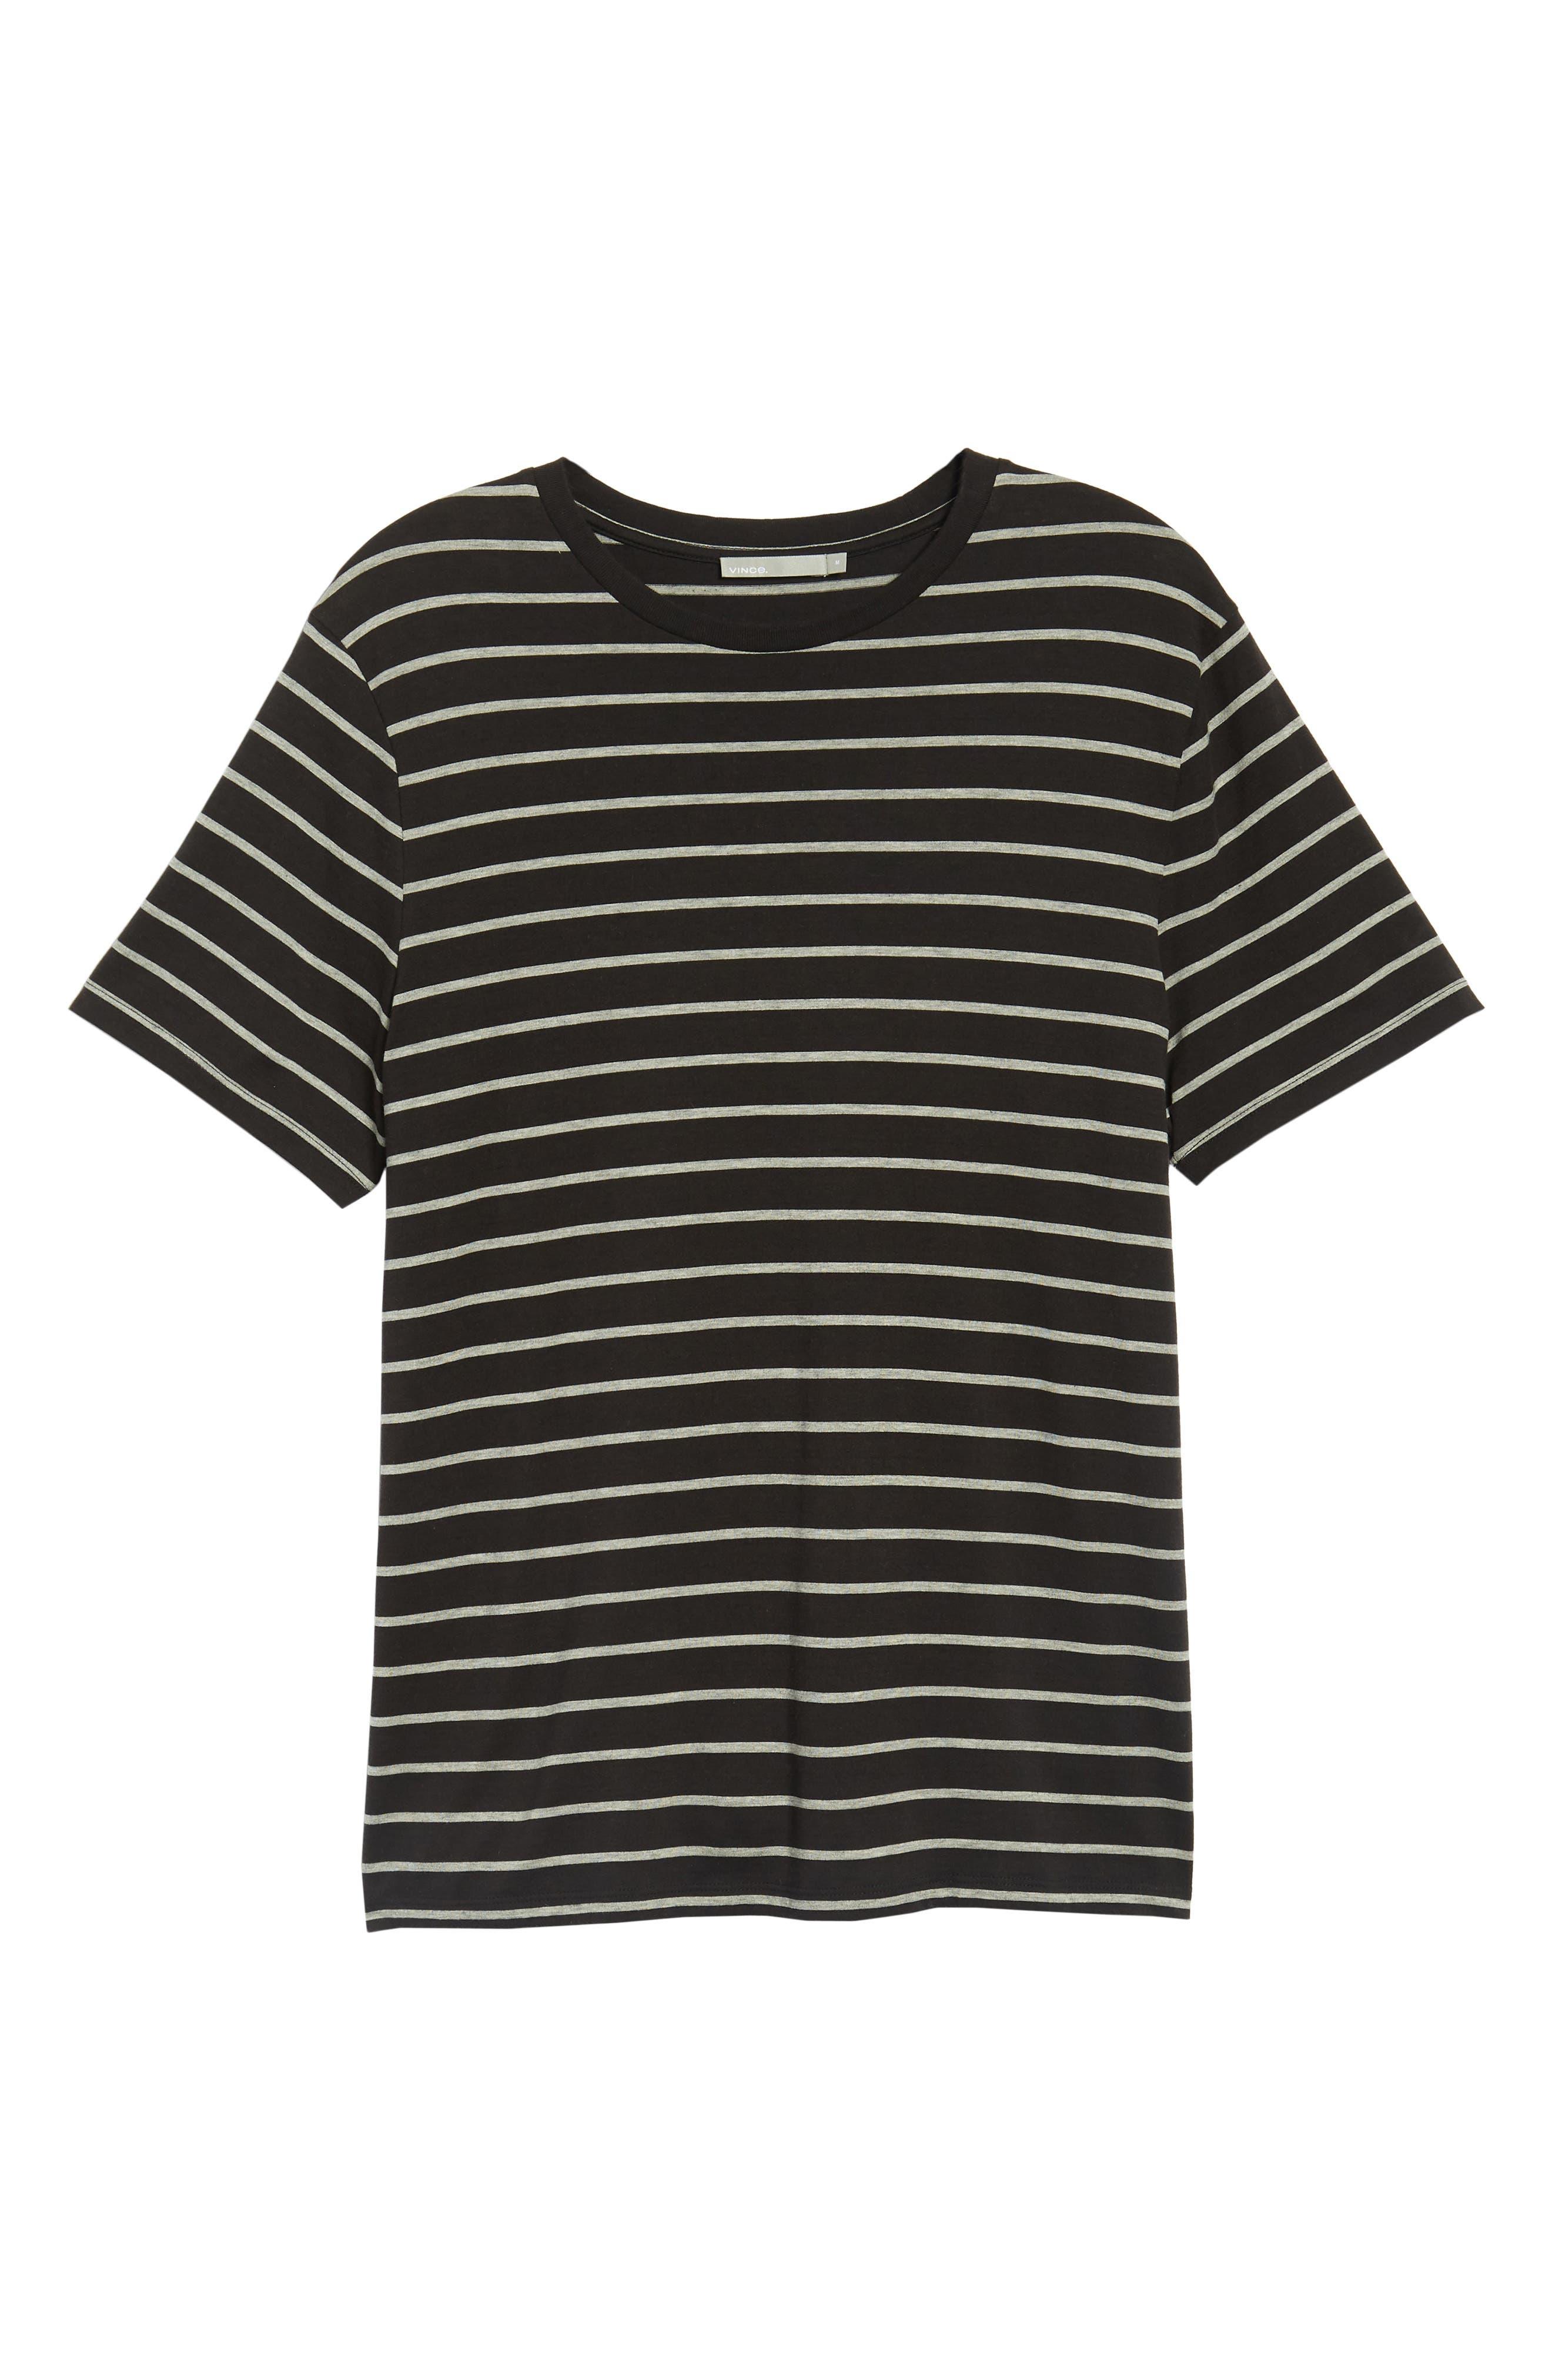 Slim Fit Heathered Stripe T-Shirt,                             Alternate thumbnail 6, color,                             Black/ Heather Steel